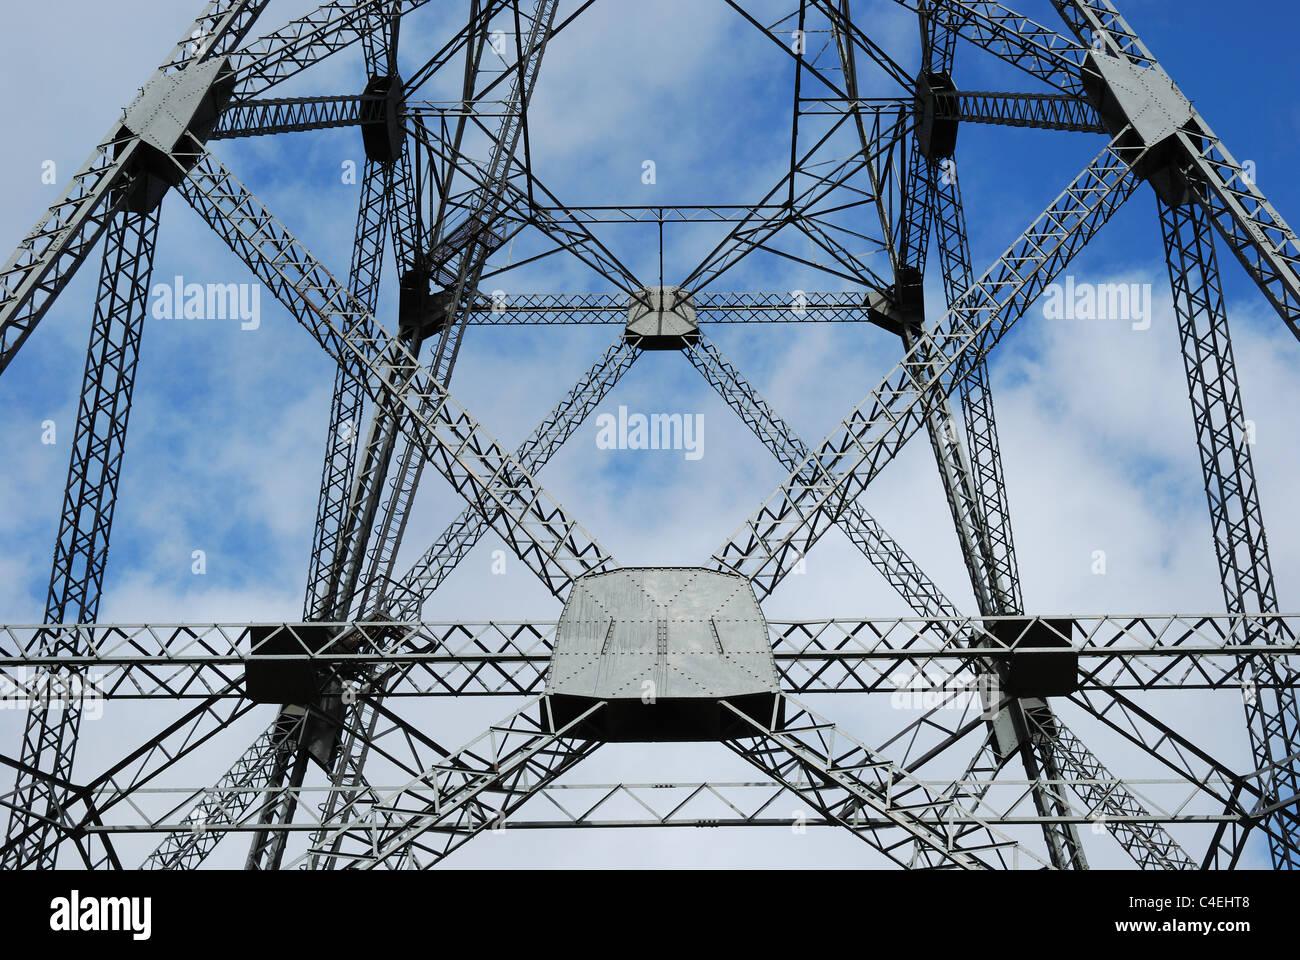 Electricity pylon, Wales, UK Stock Photo